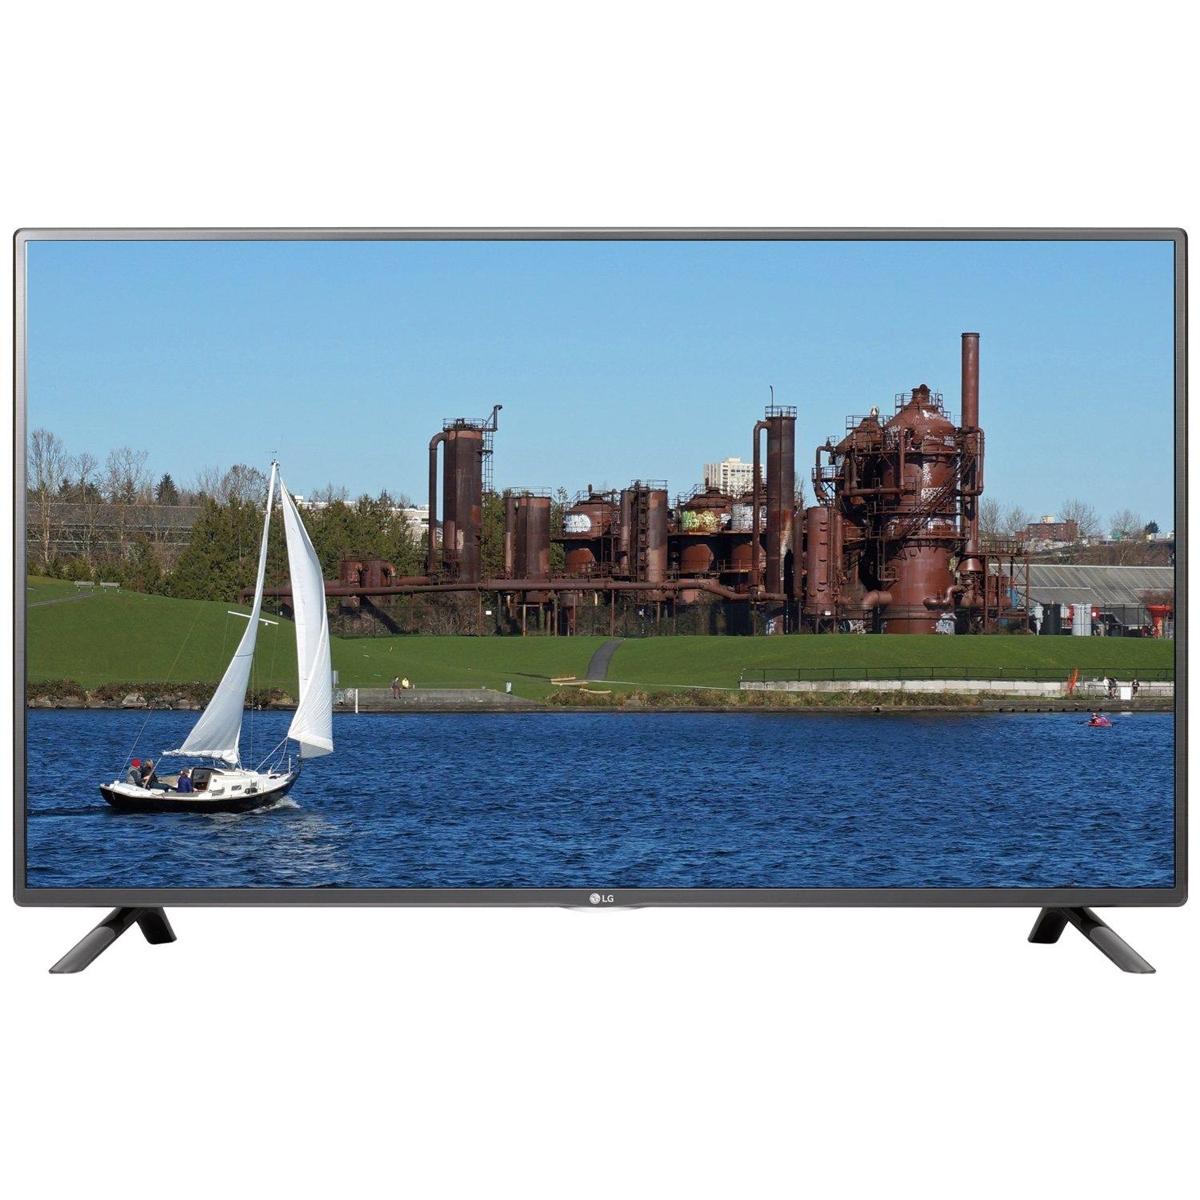 LG 50inch 6000 Series LED HDTV - 50LF6000